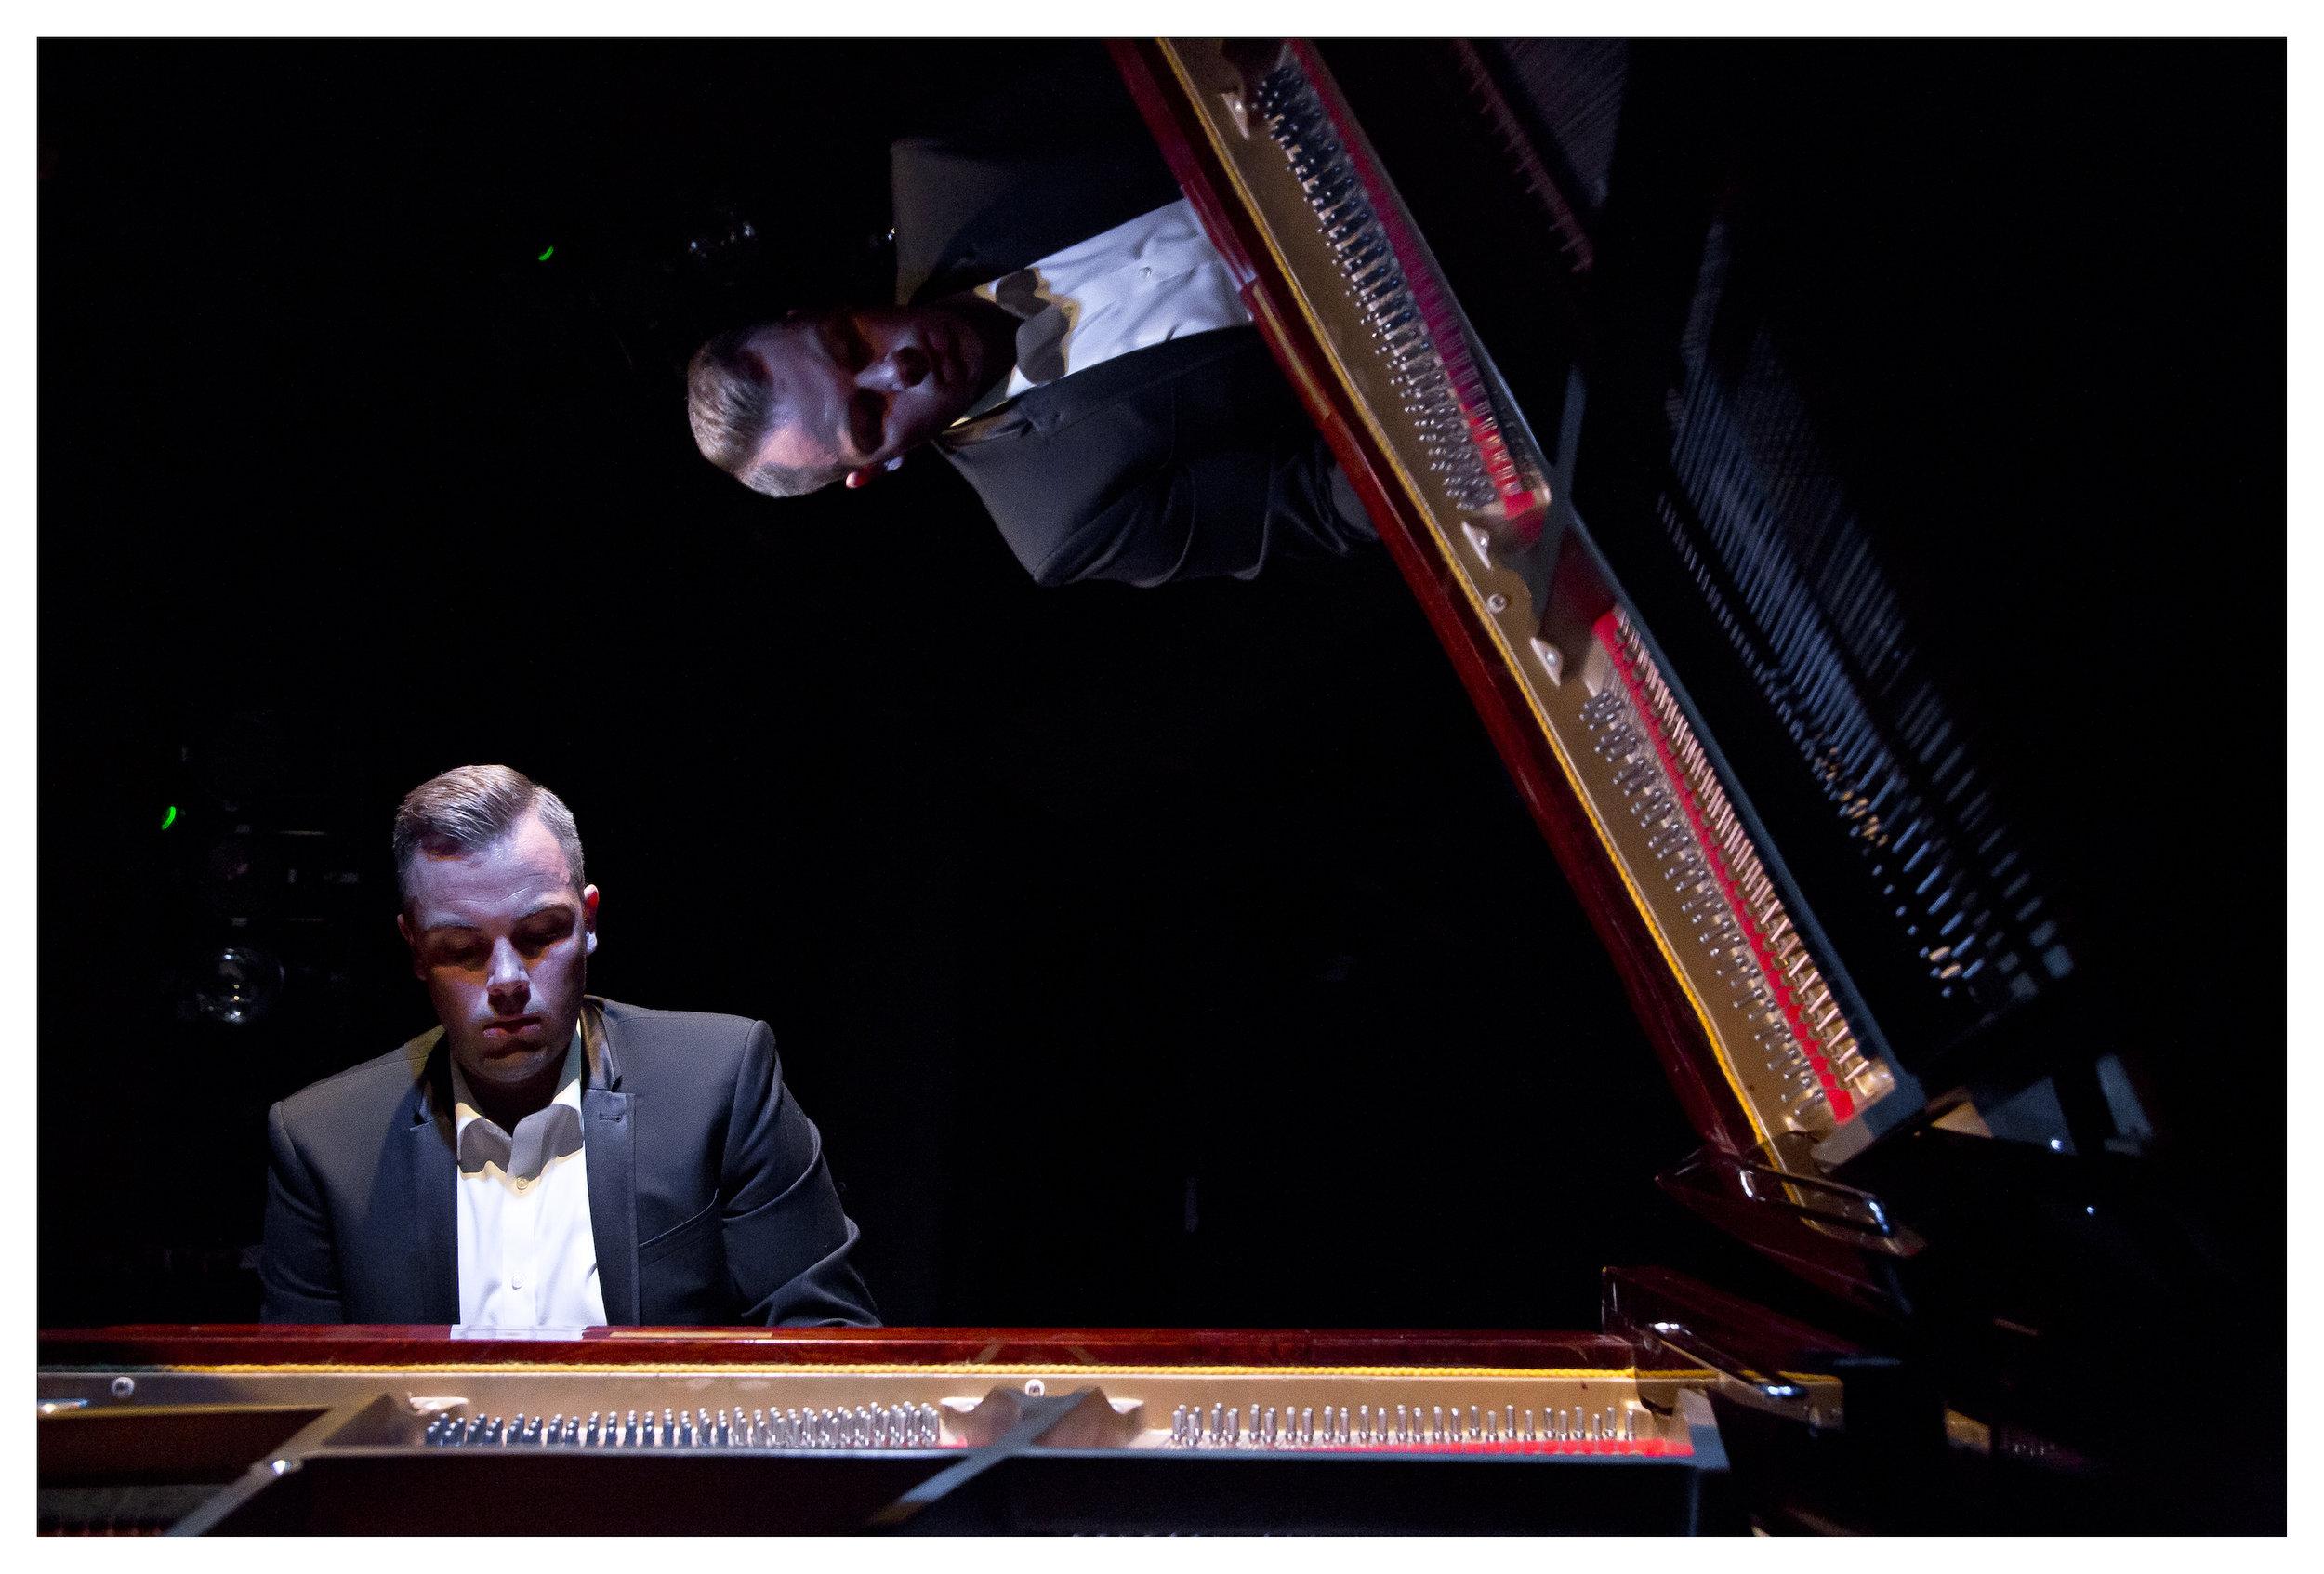 Concerto - Piano.jpg